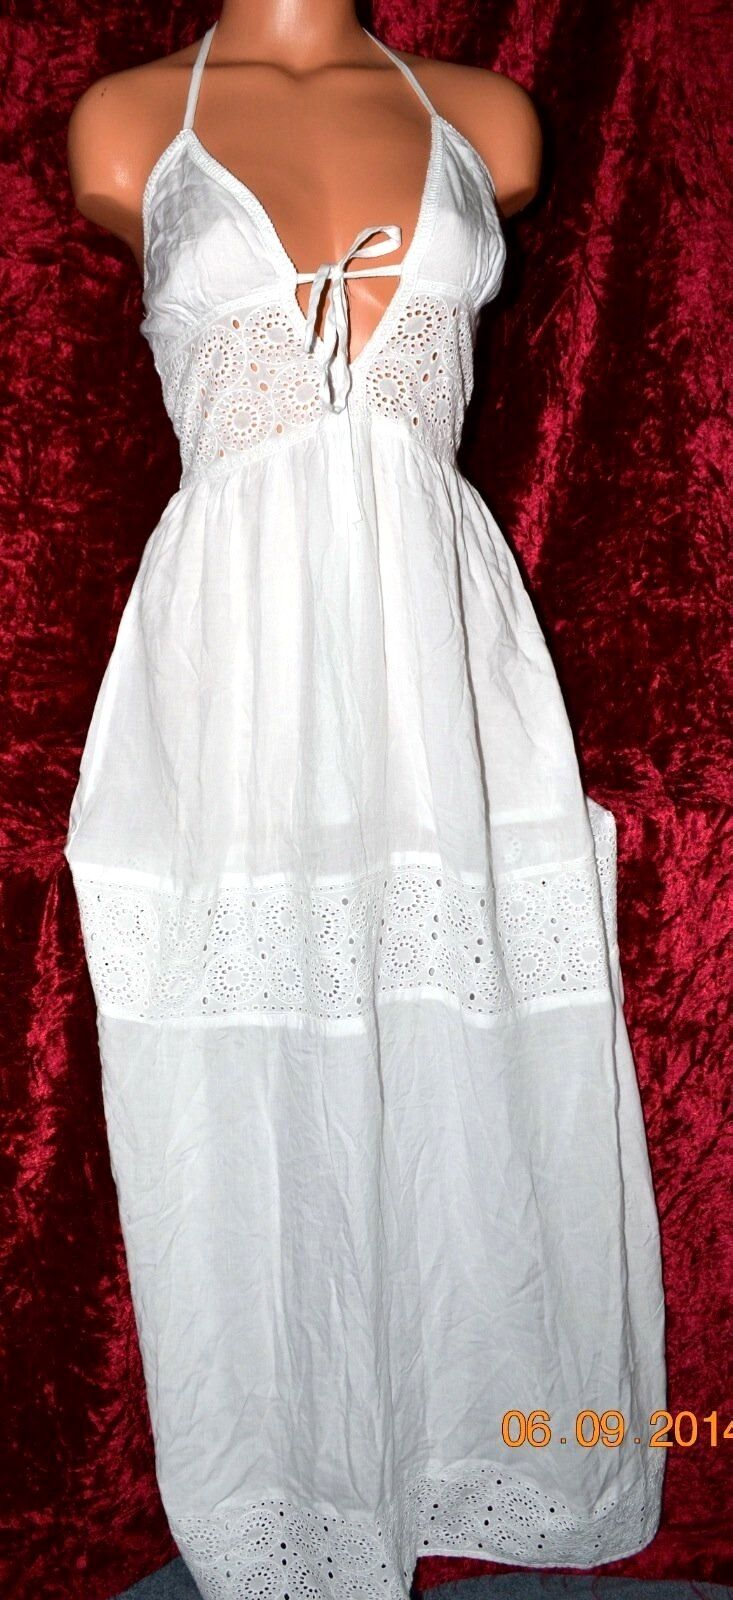 100 Victorias Secret Supermodel Summer White Cotton Cover up Maxi Dress NWT 6